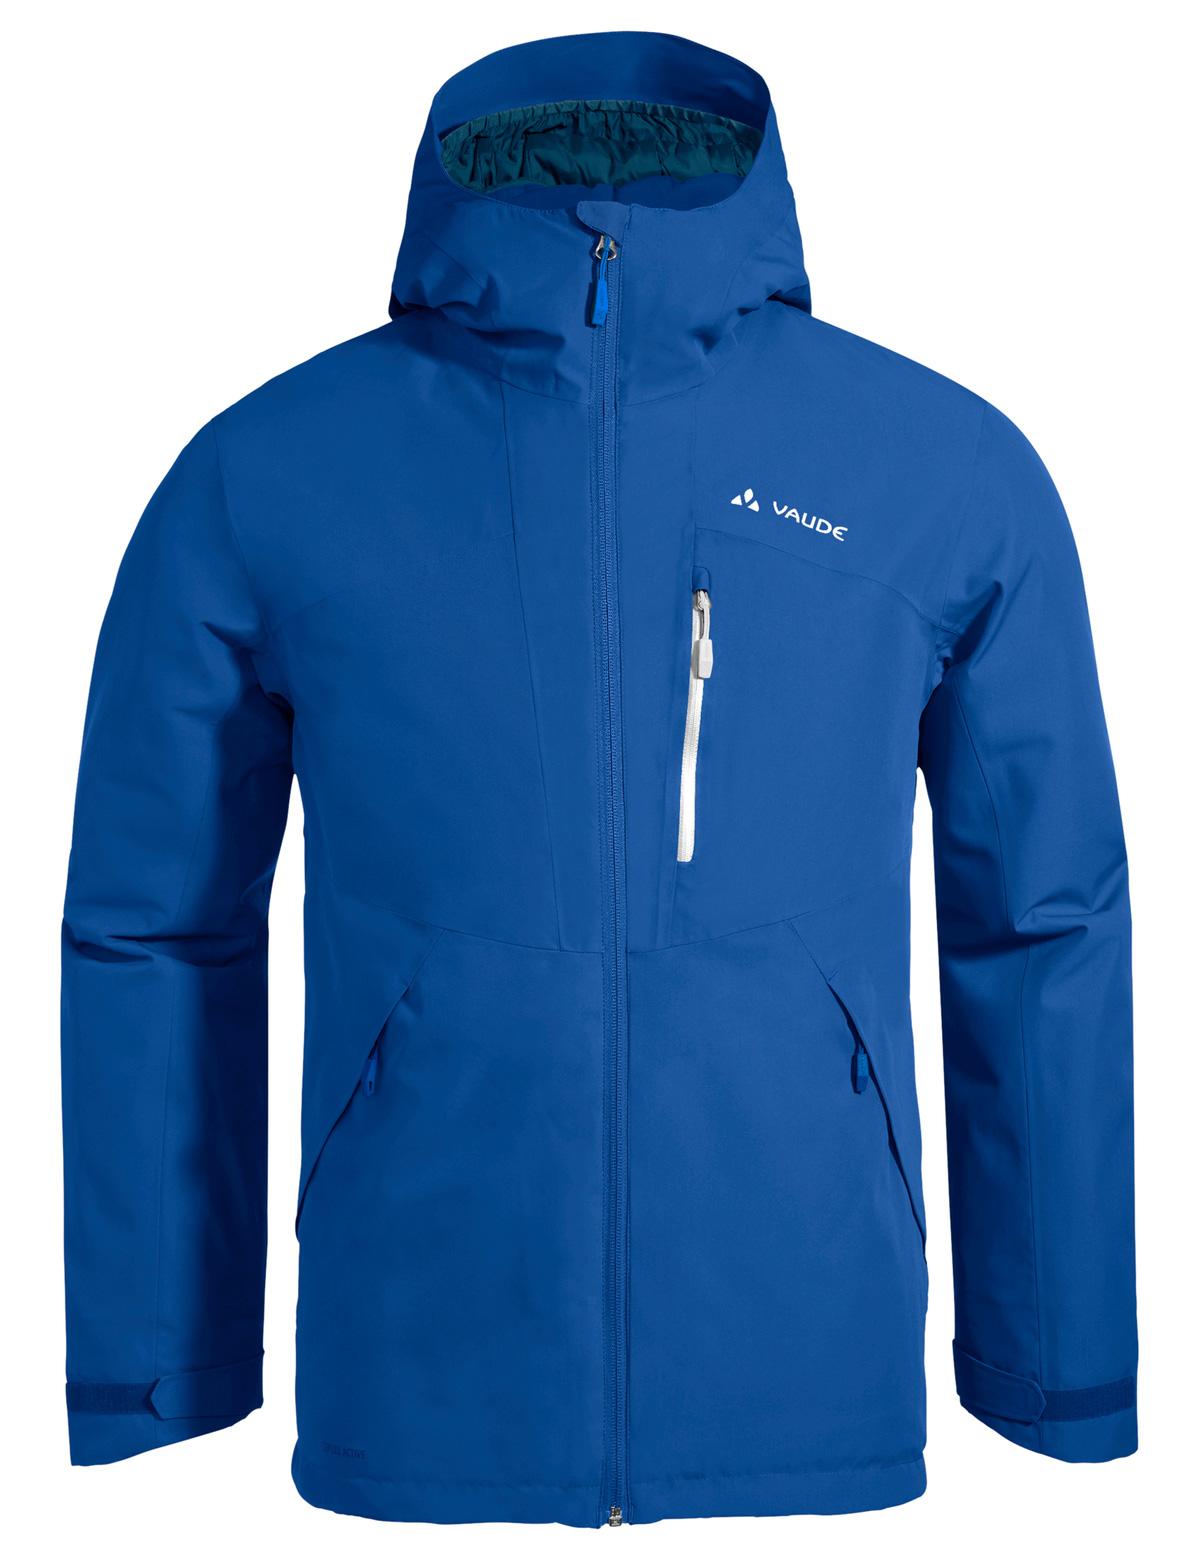 Vaude Men's Miskanti Jacket - signal blue